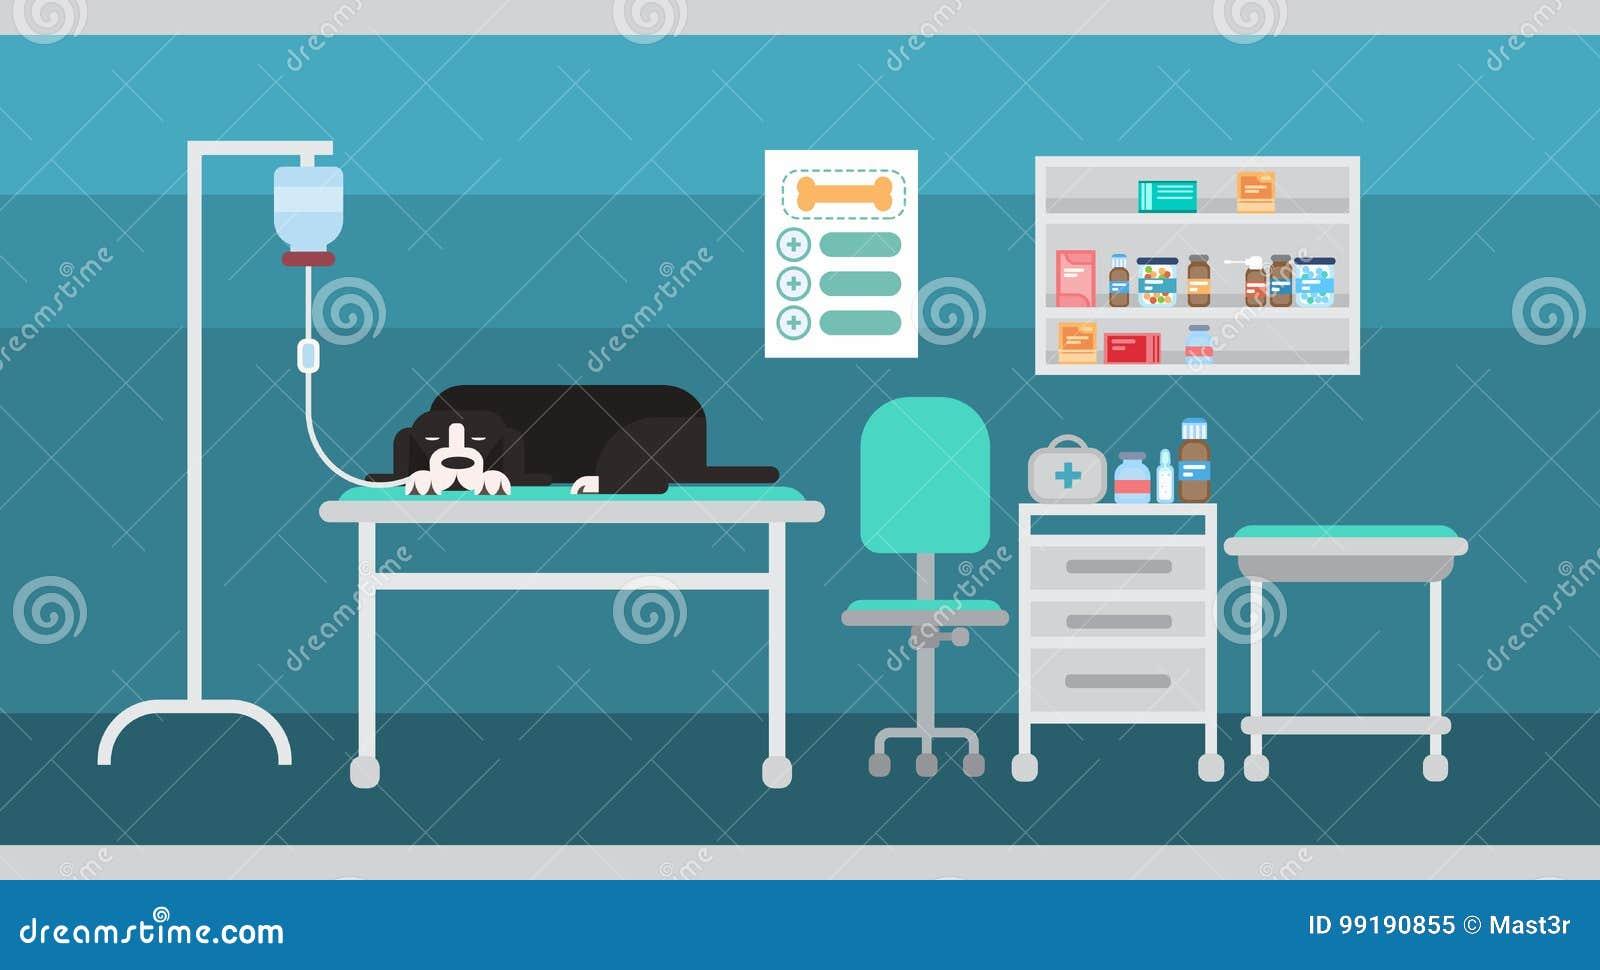 Cão na clínica do veterinário do interior médico do hospital do auxílio veterinário